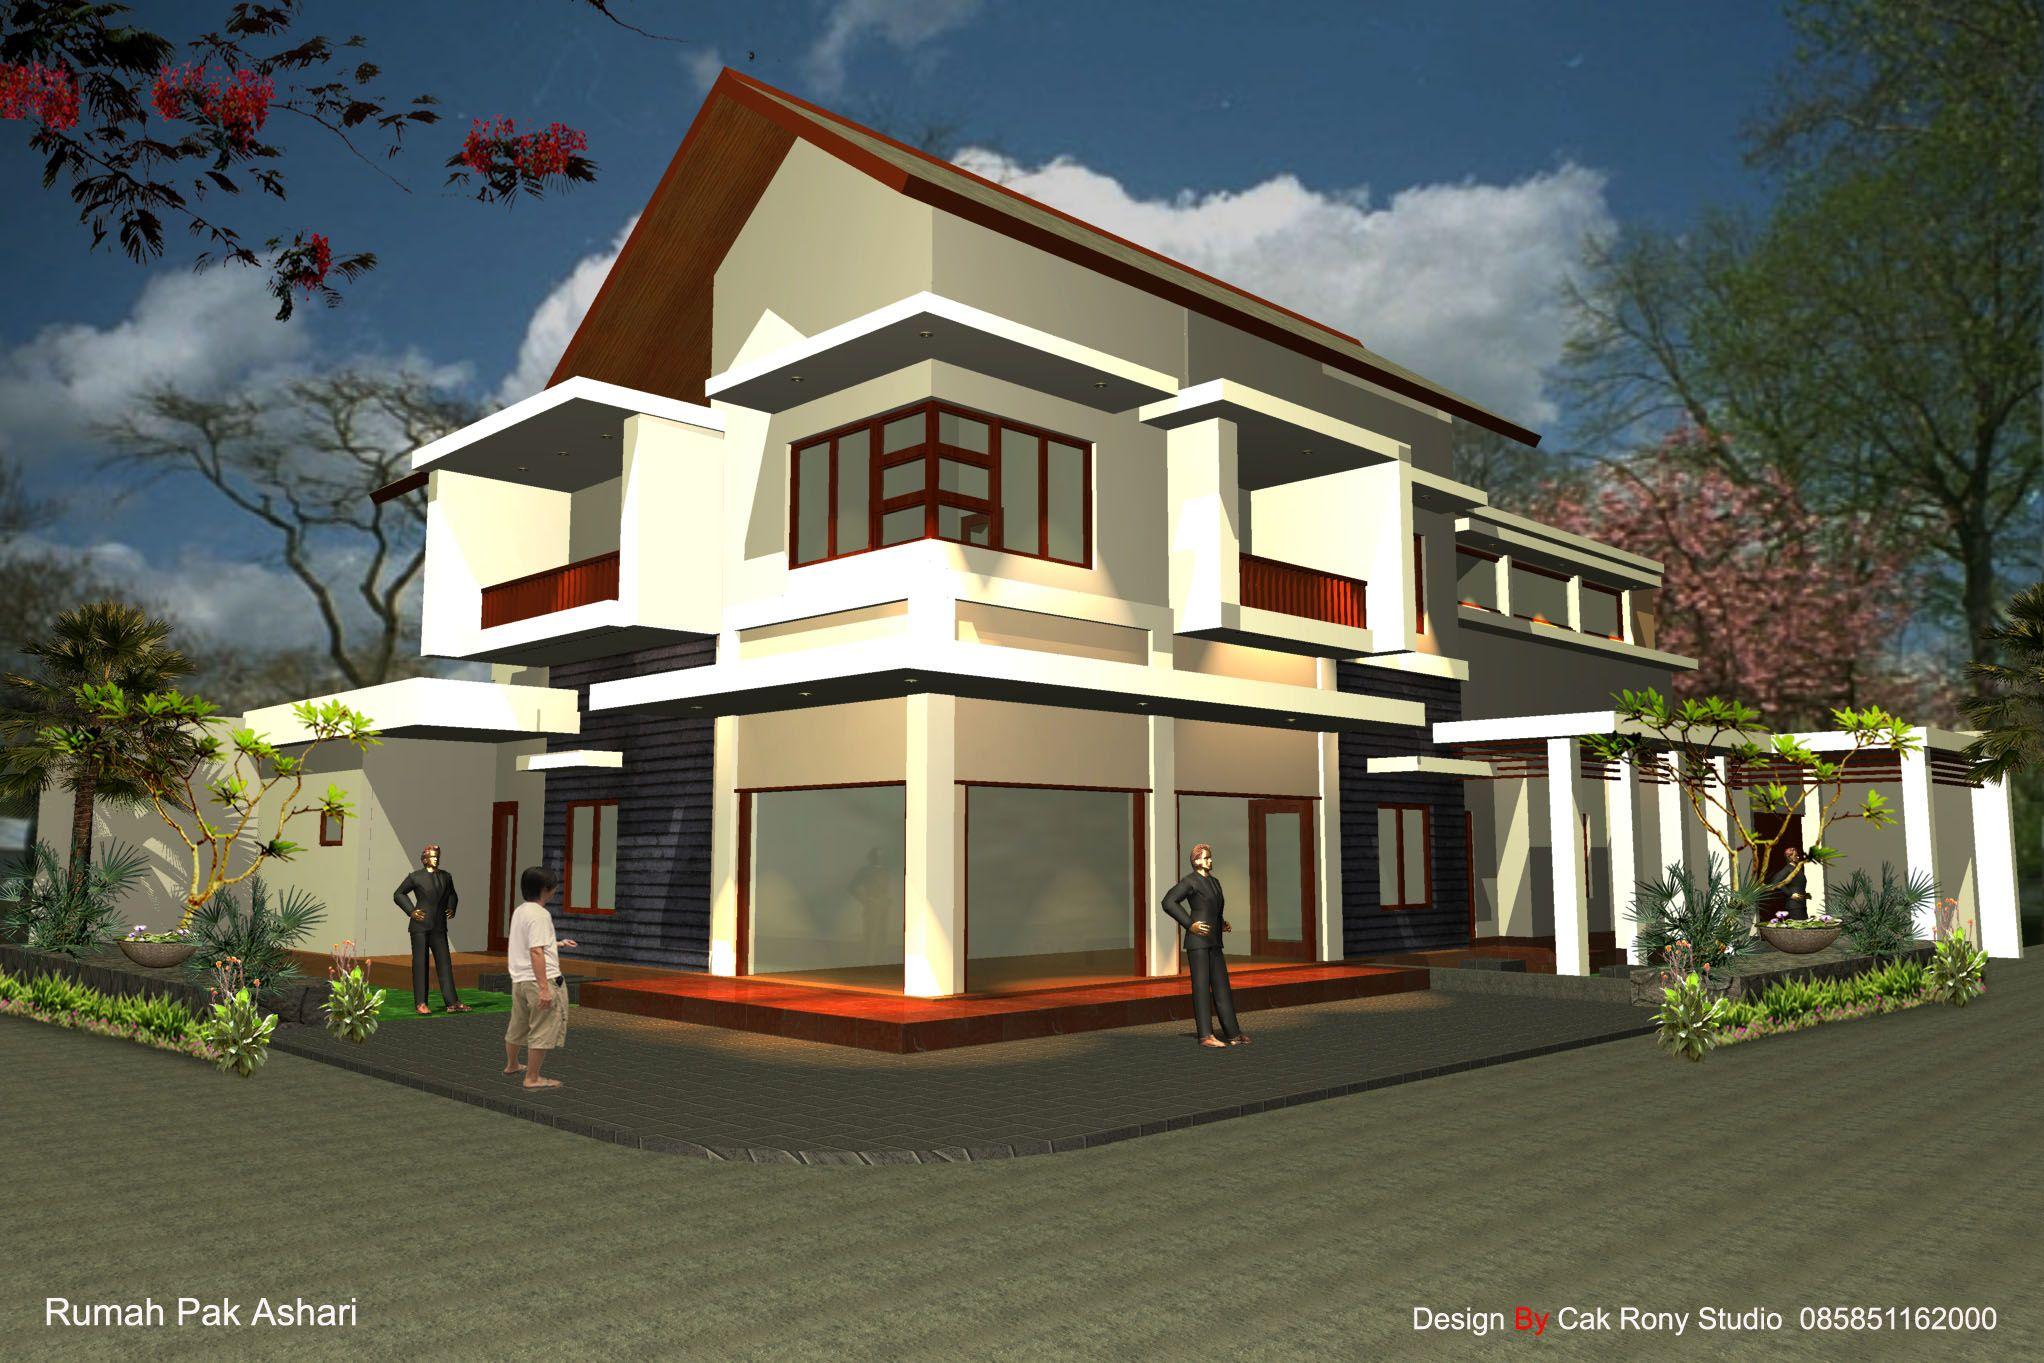 Brunei modern home design interior gallery of brunei modern home design interior 21824 at good live com